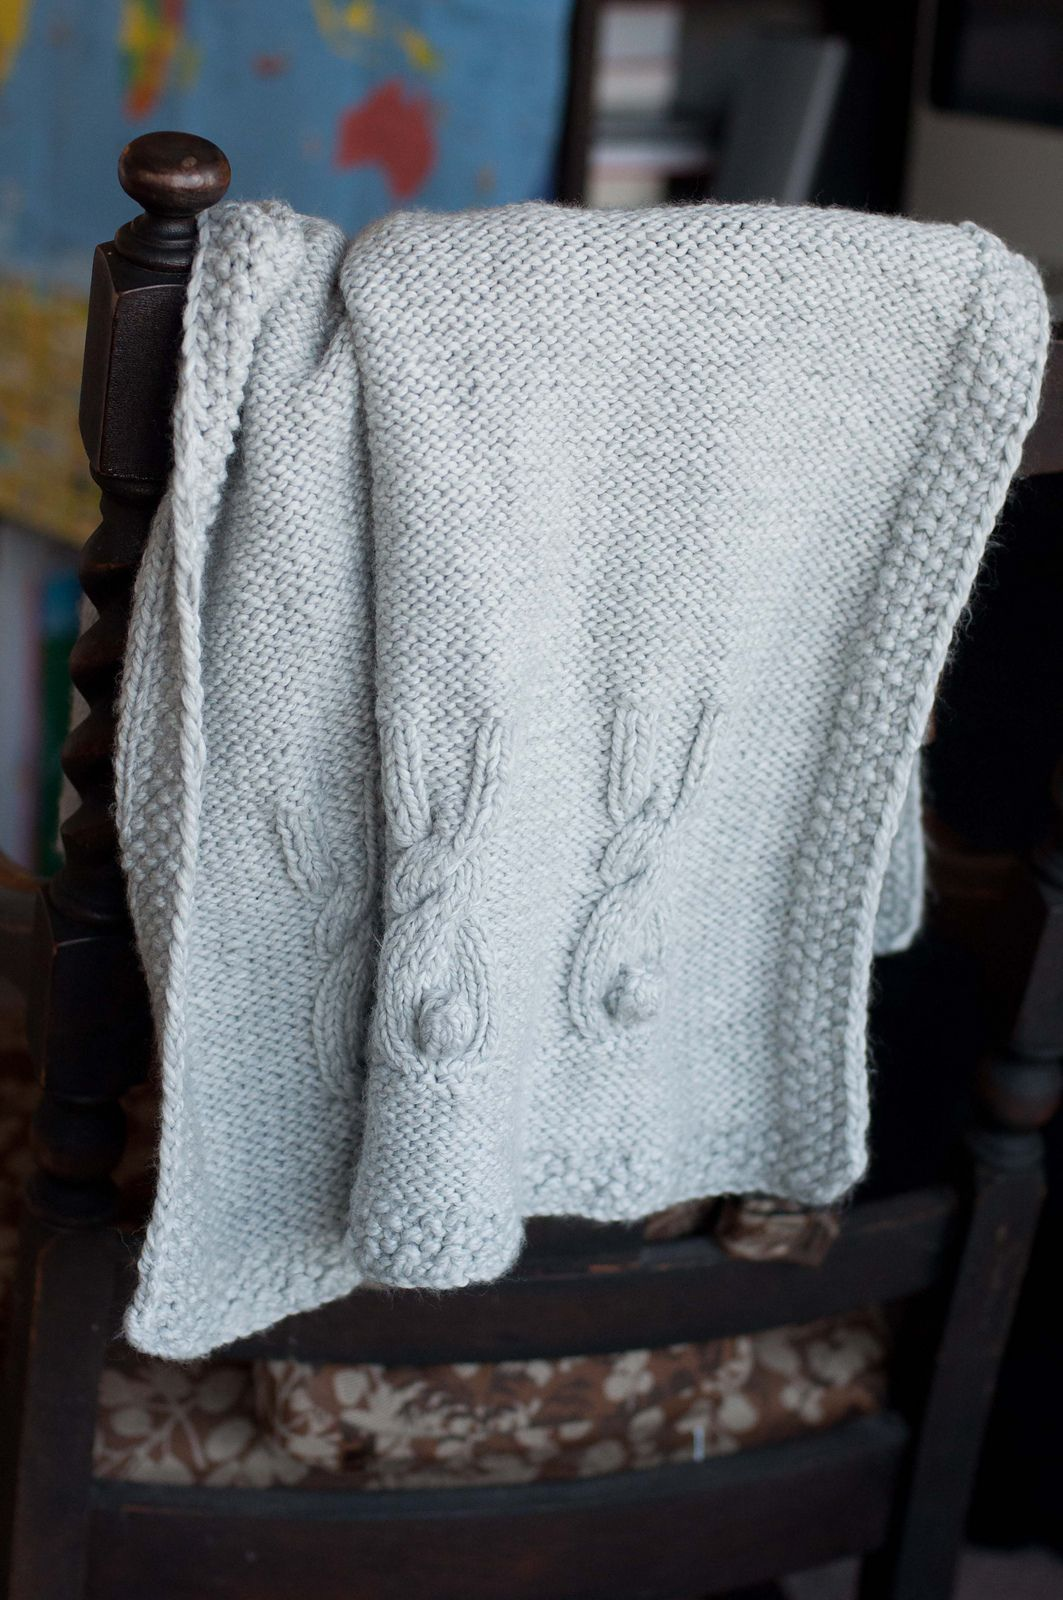 Ravelry: Heirloom Bunny Blanket pattern by Stacylynn Cottle